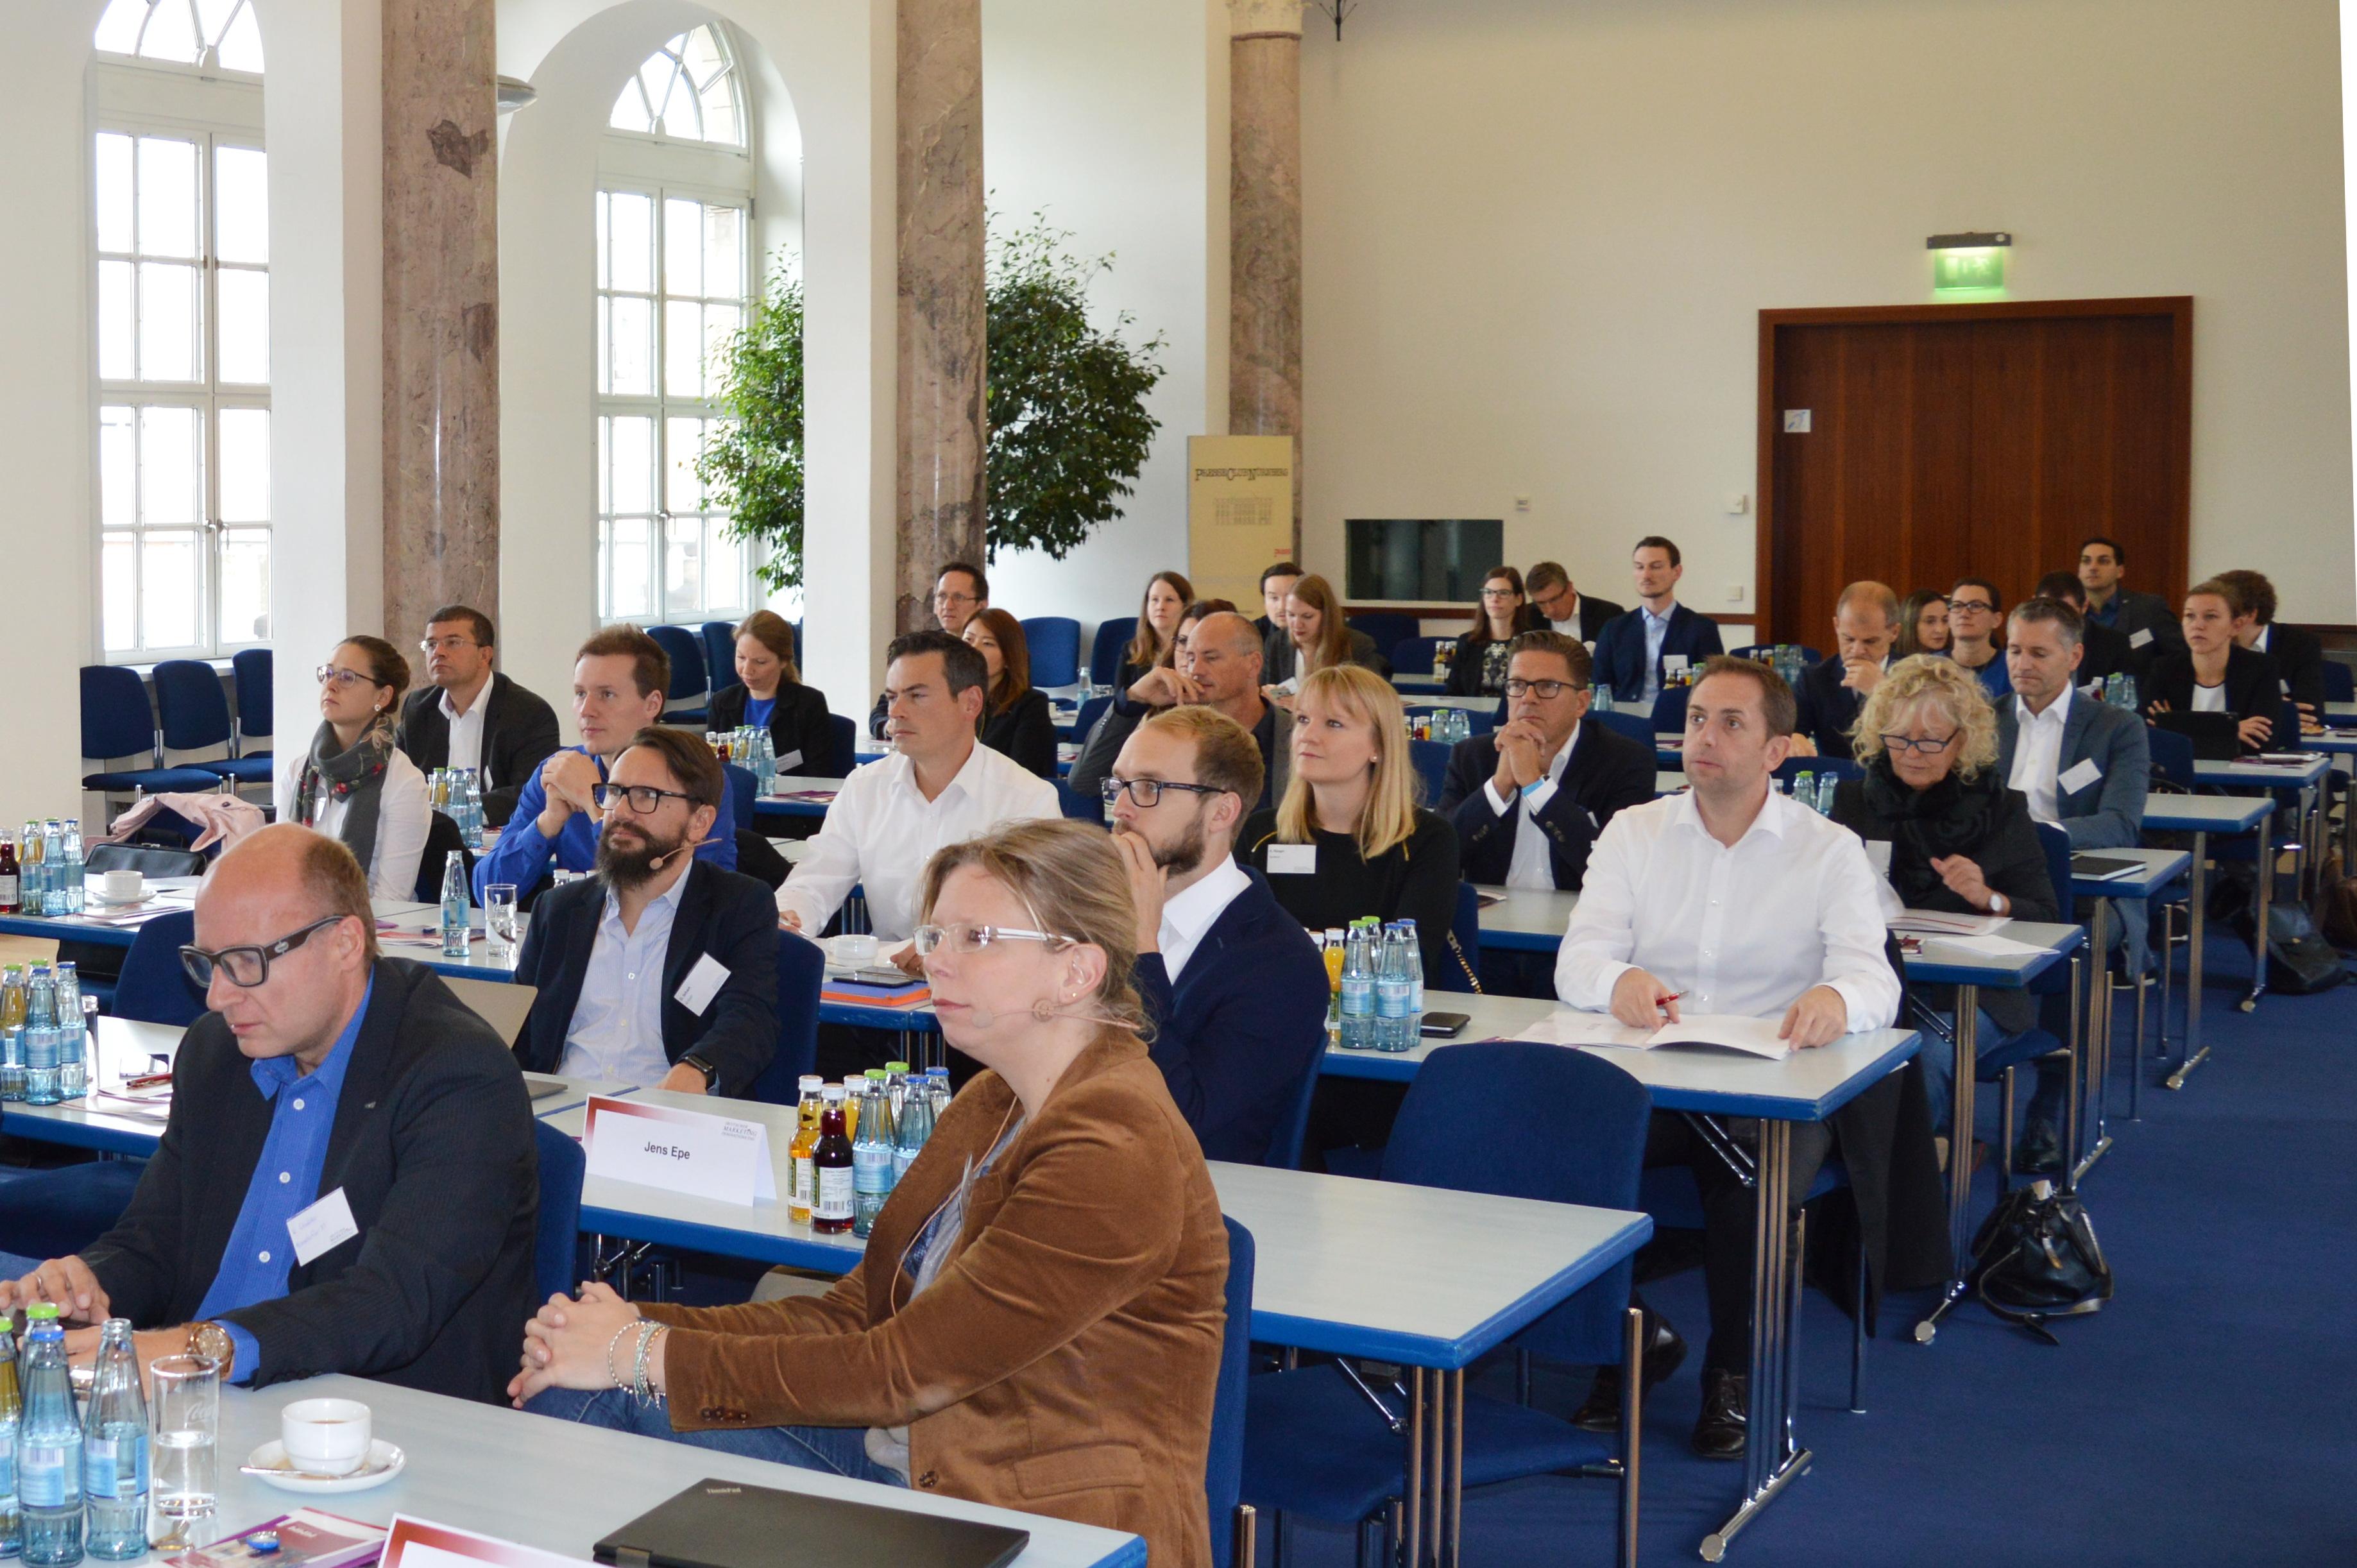 Teilnehmer im Marmorsaal in Nürnberg